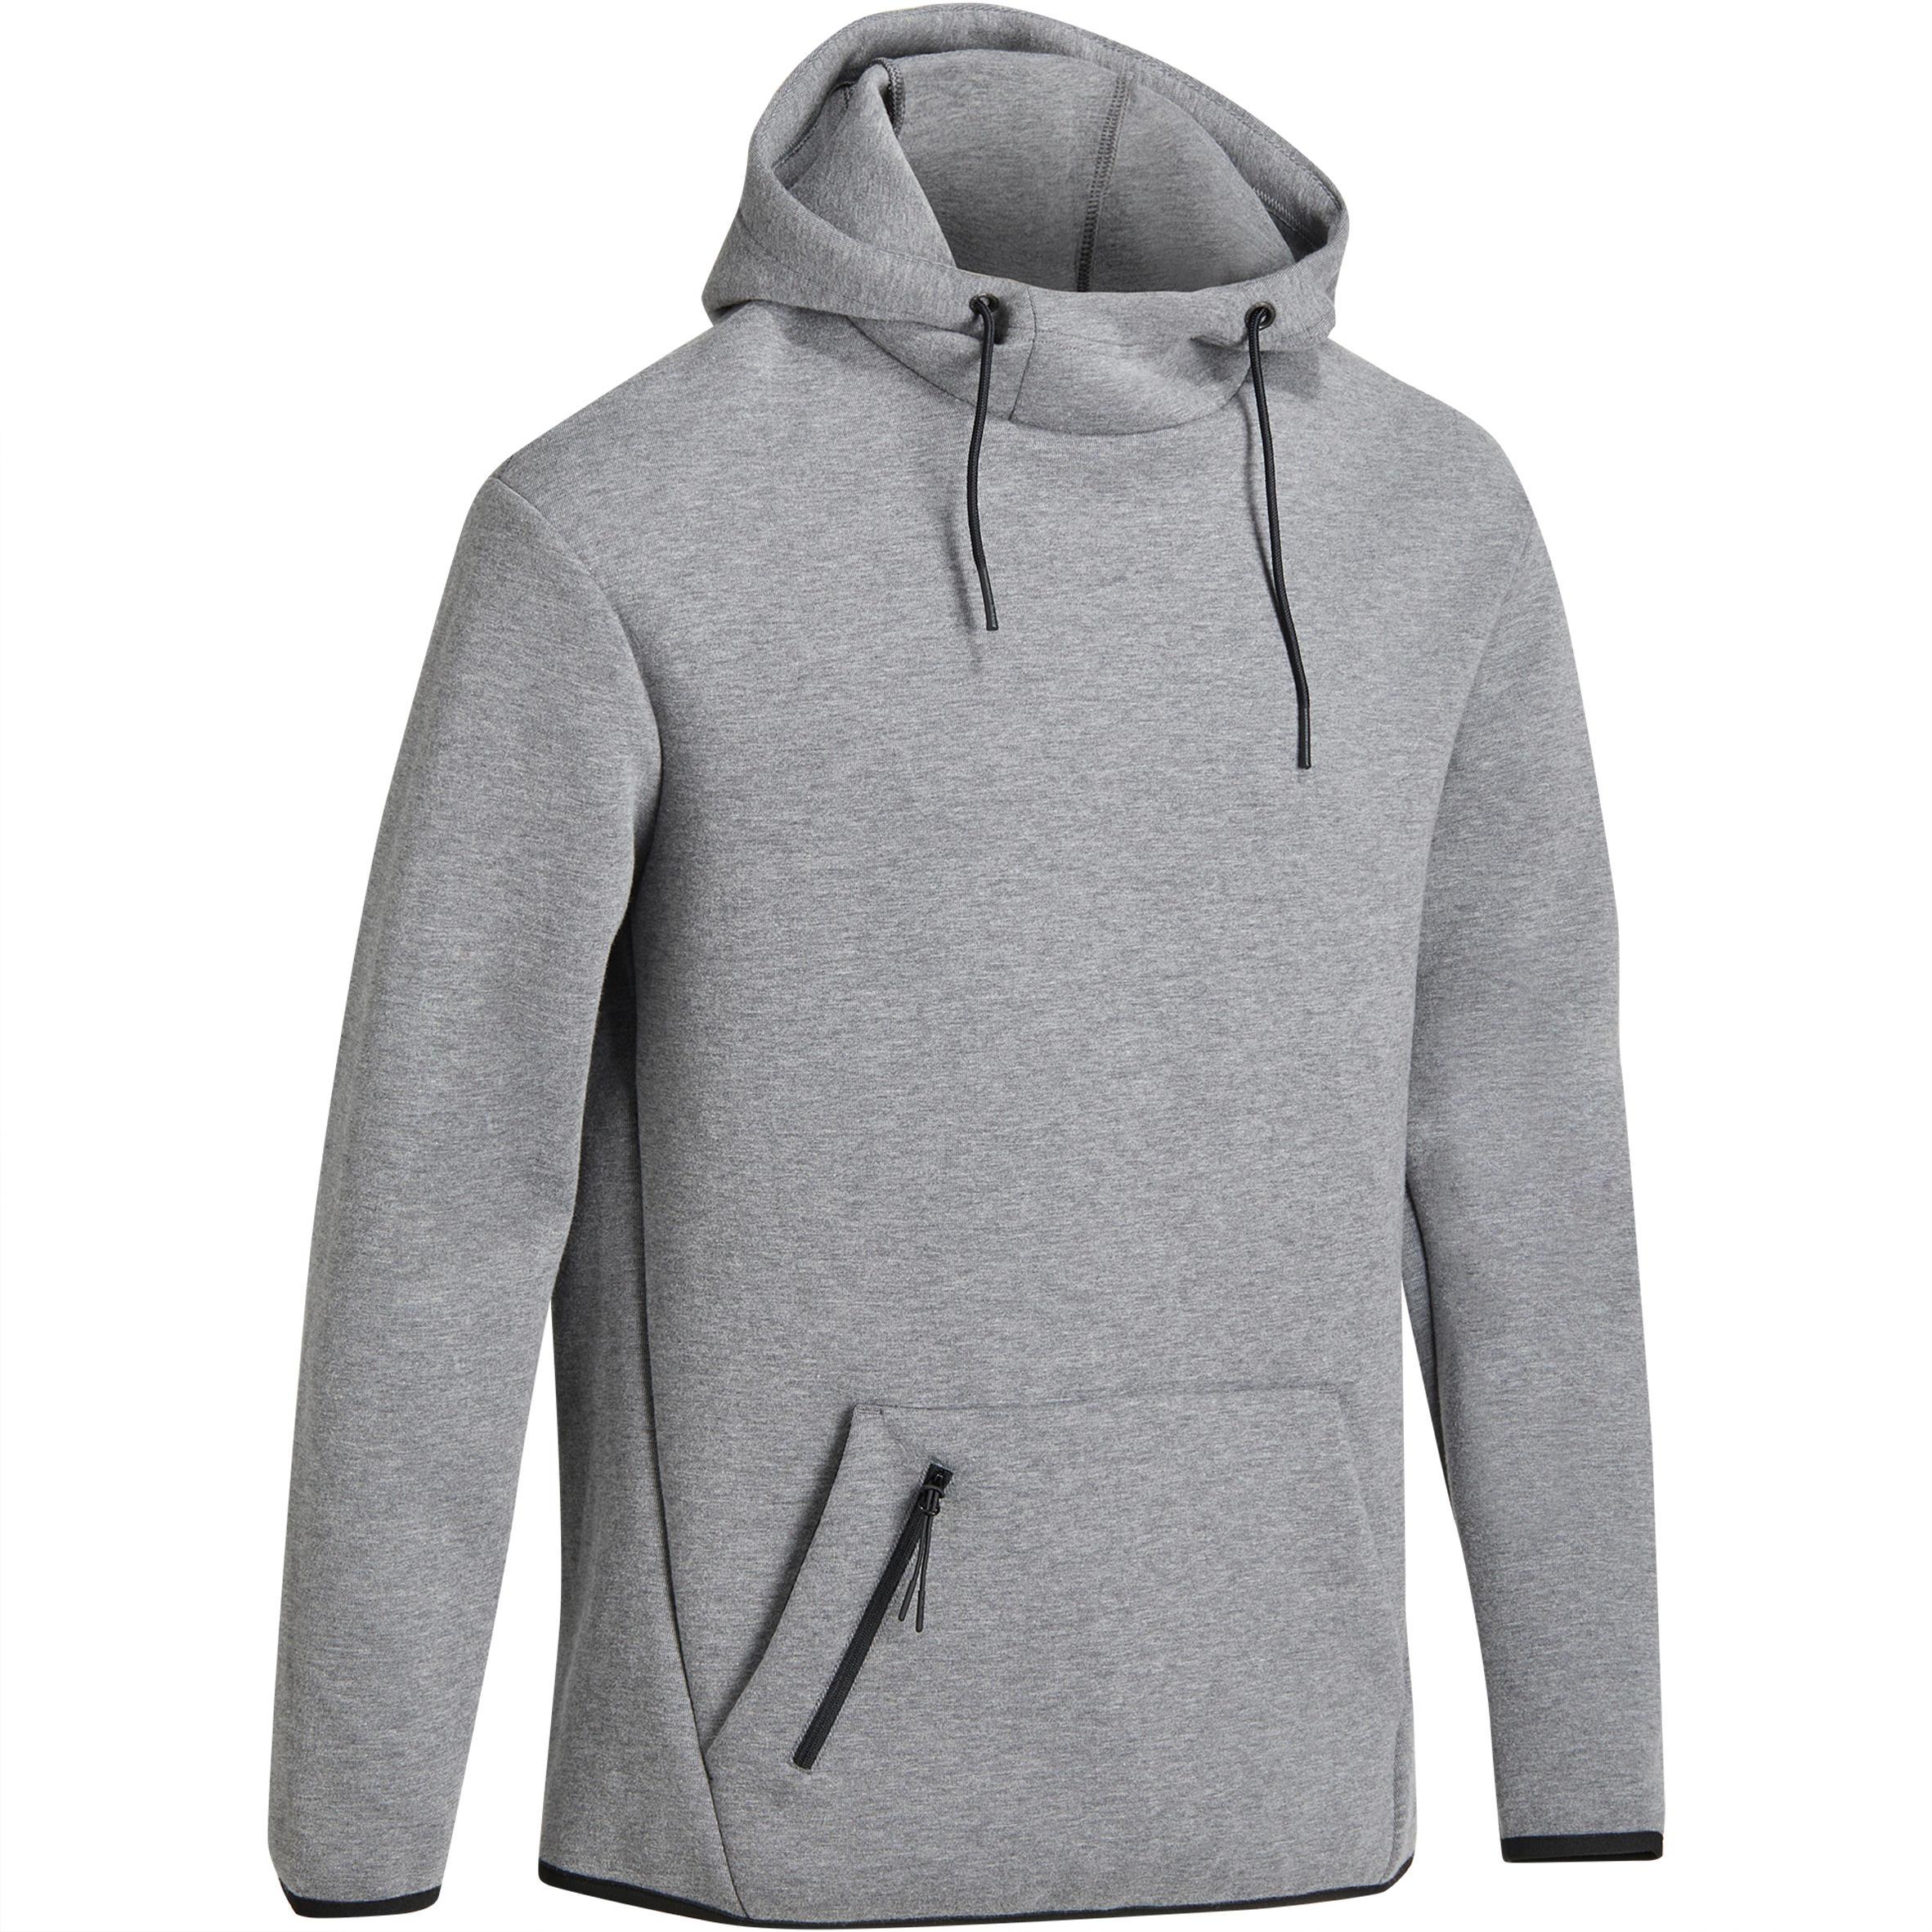 Domyos Heren hoodie in spacer-stof voor gym en pilates